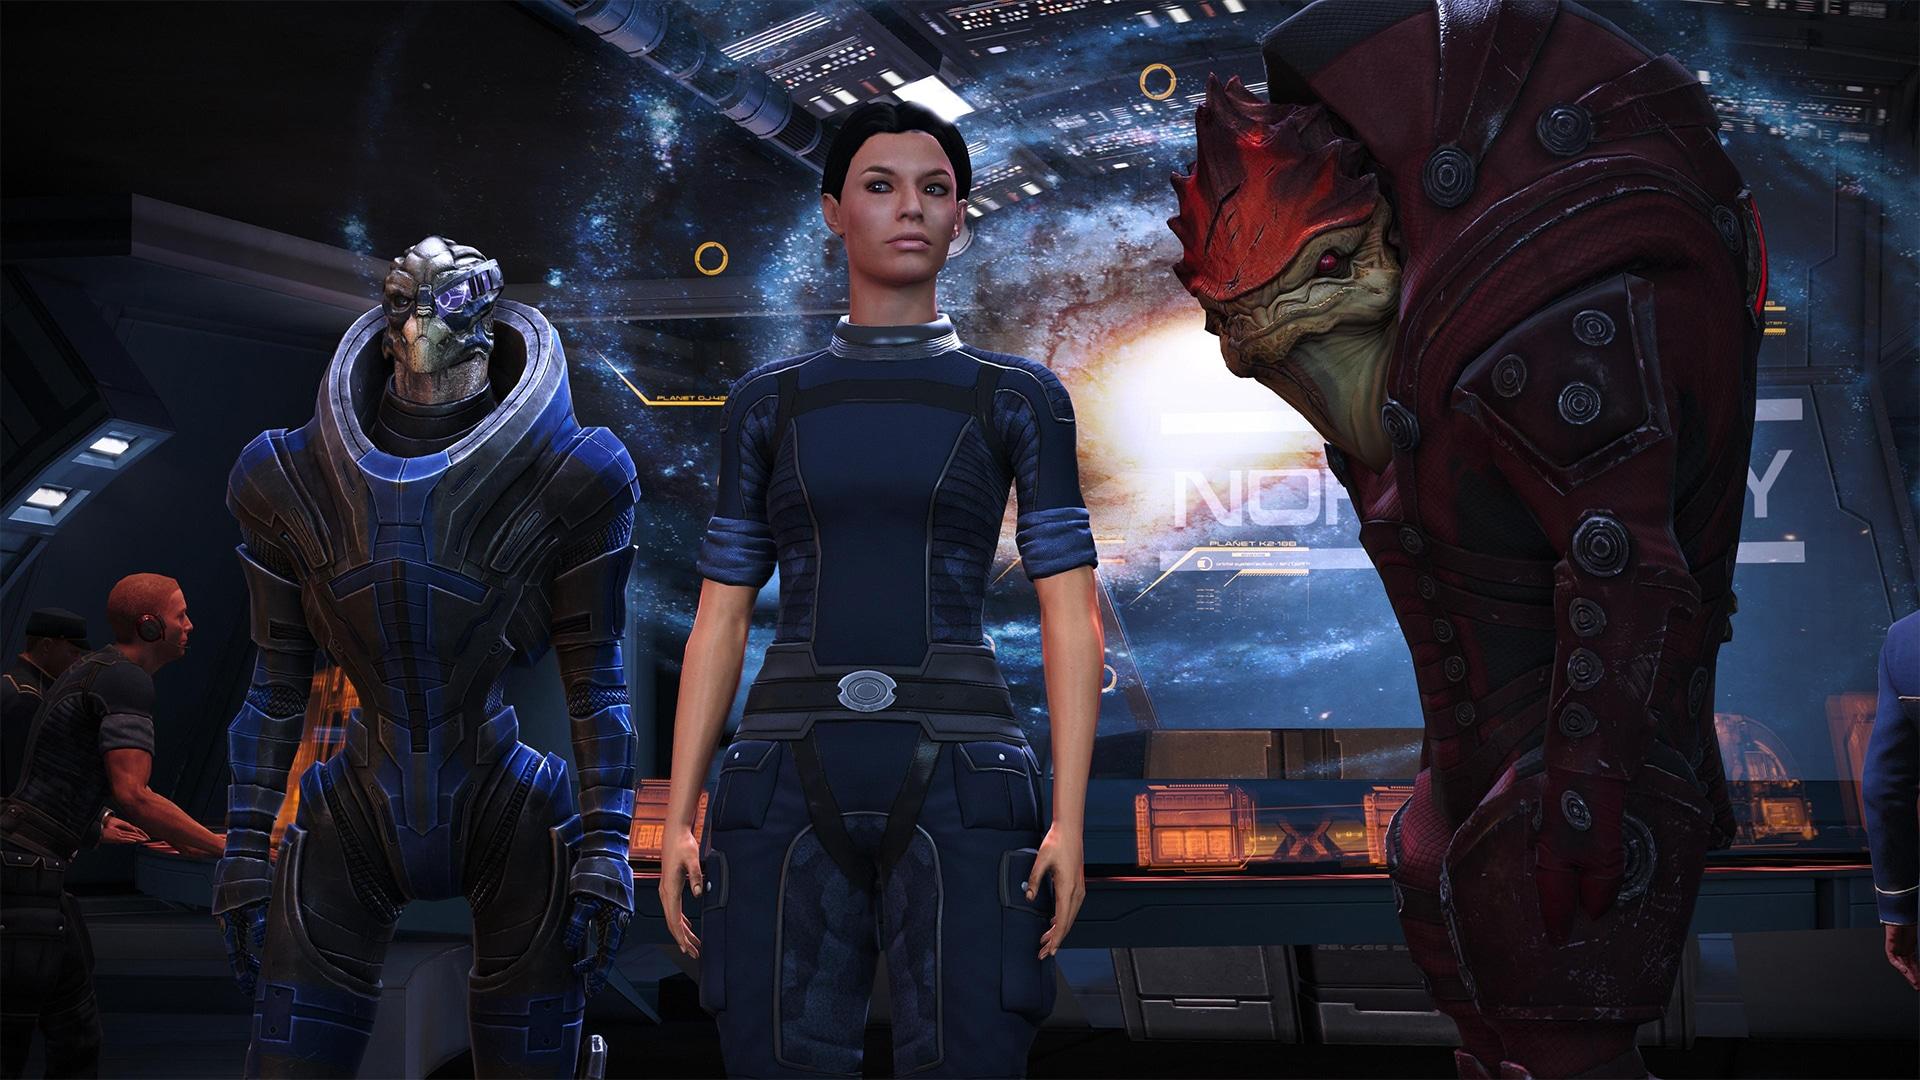 Mass Effect 1 aged worse than Mass Effect: Andromeda BioWare ambition skills evolve